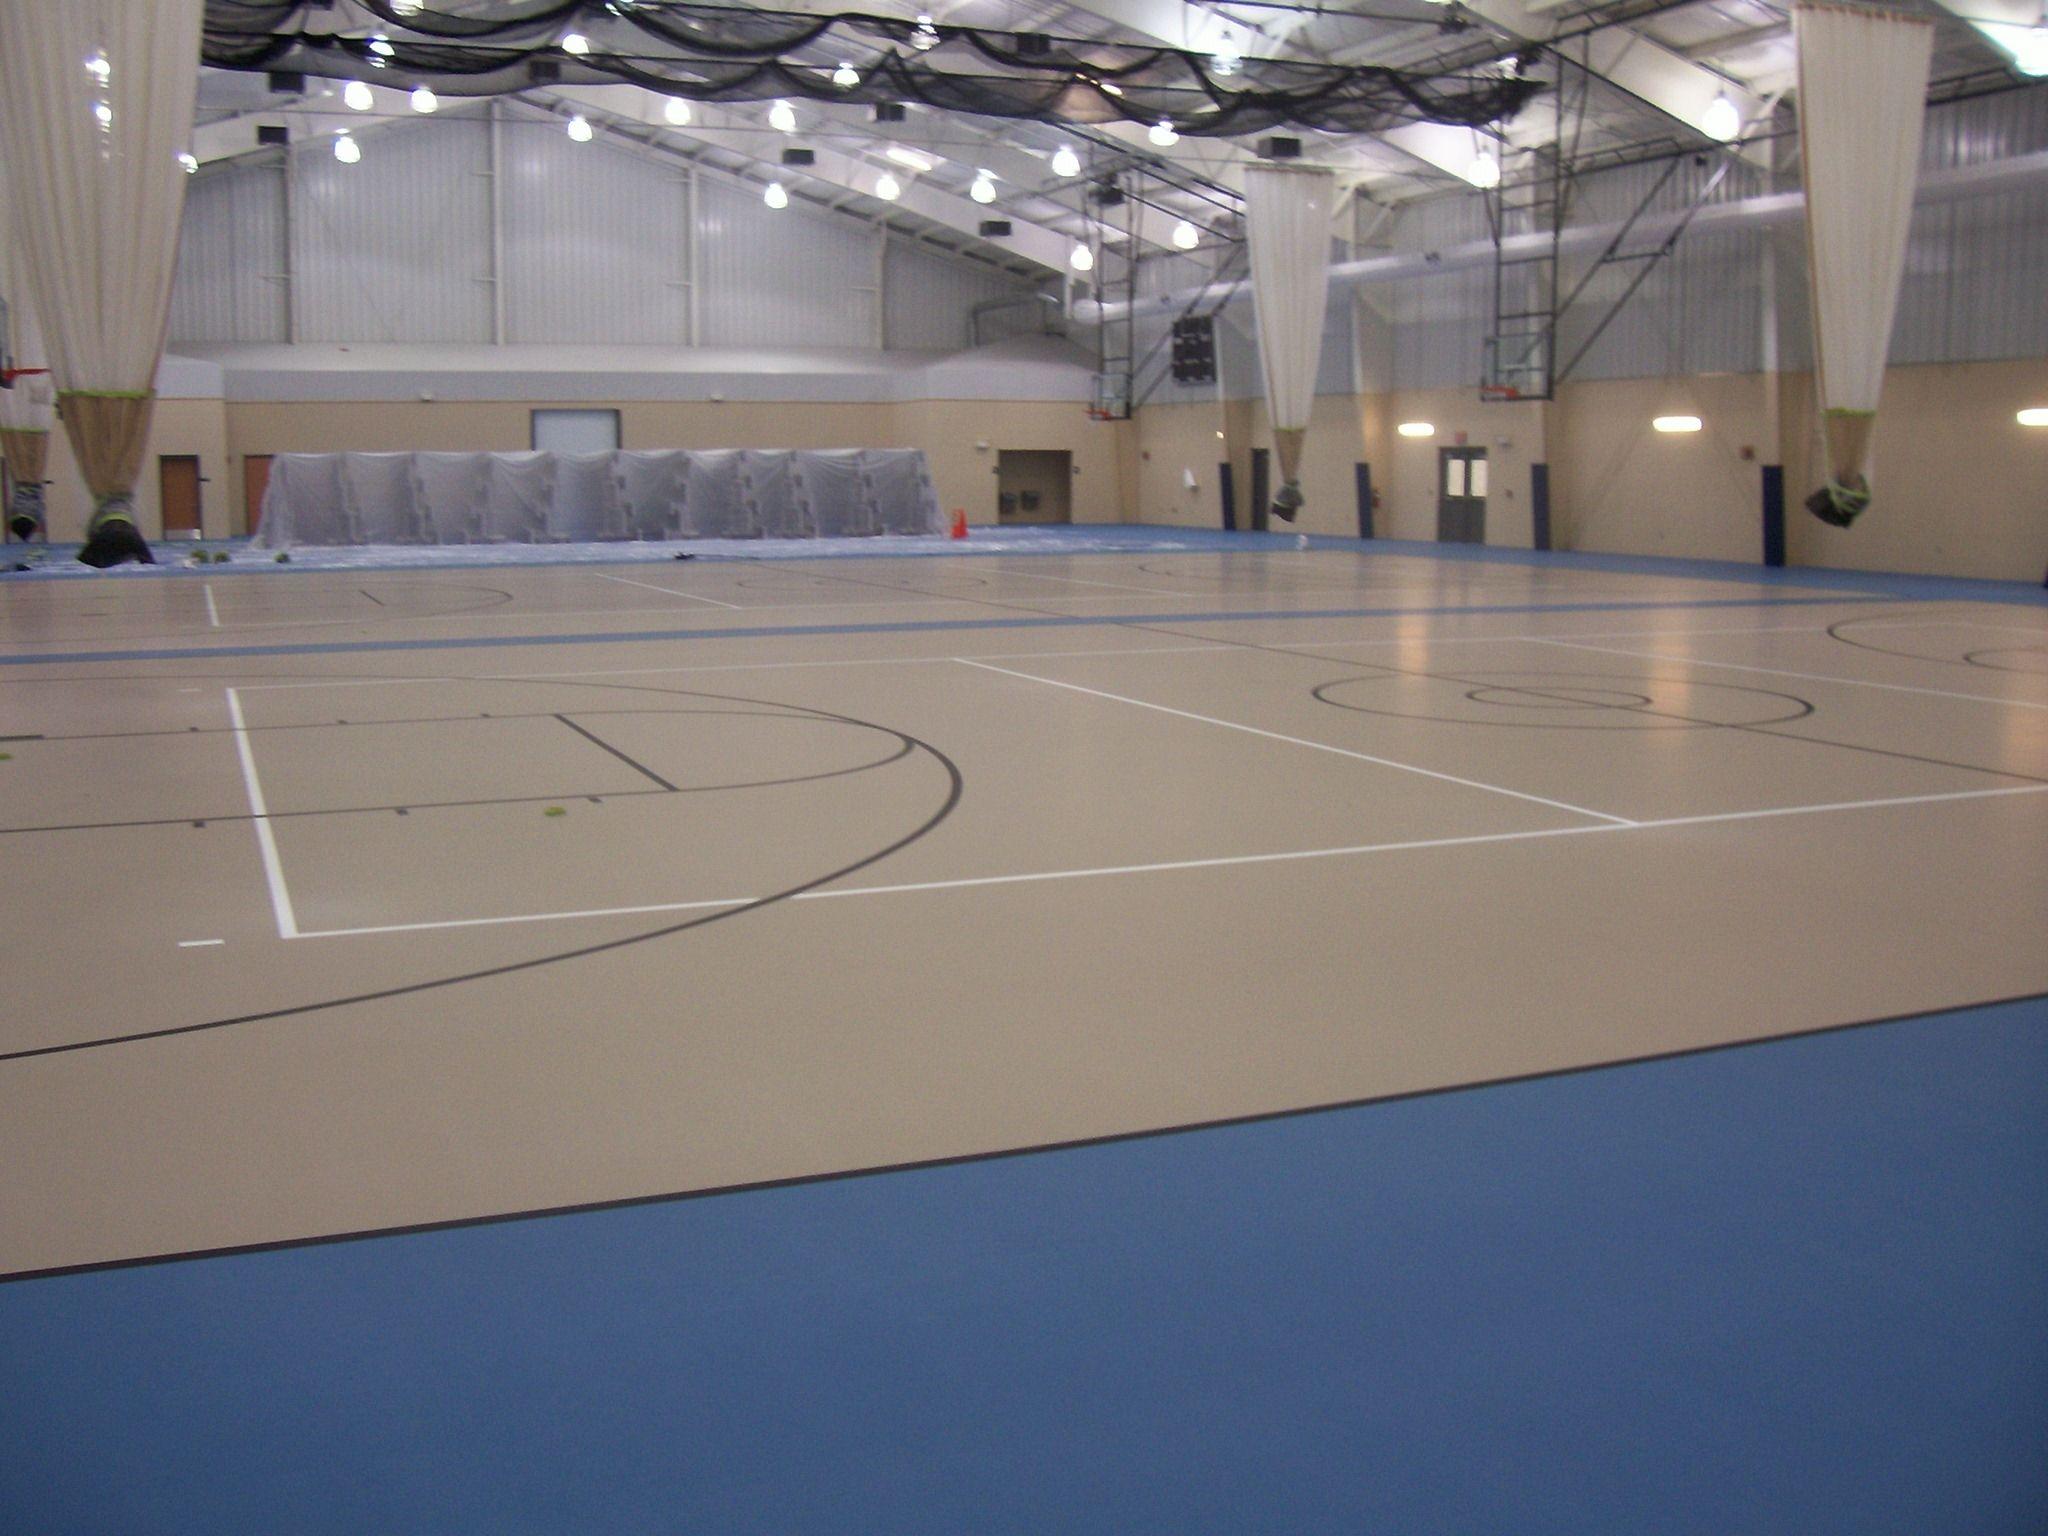 Gym Flooring Indoor Basketball Court Sports Floor Construction Indoor Basketball Indoor Gym Indoor Volleyball